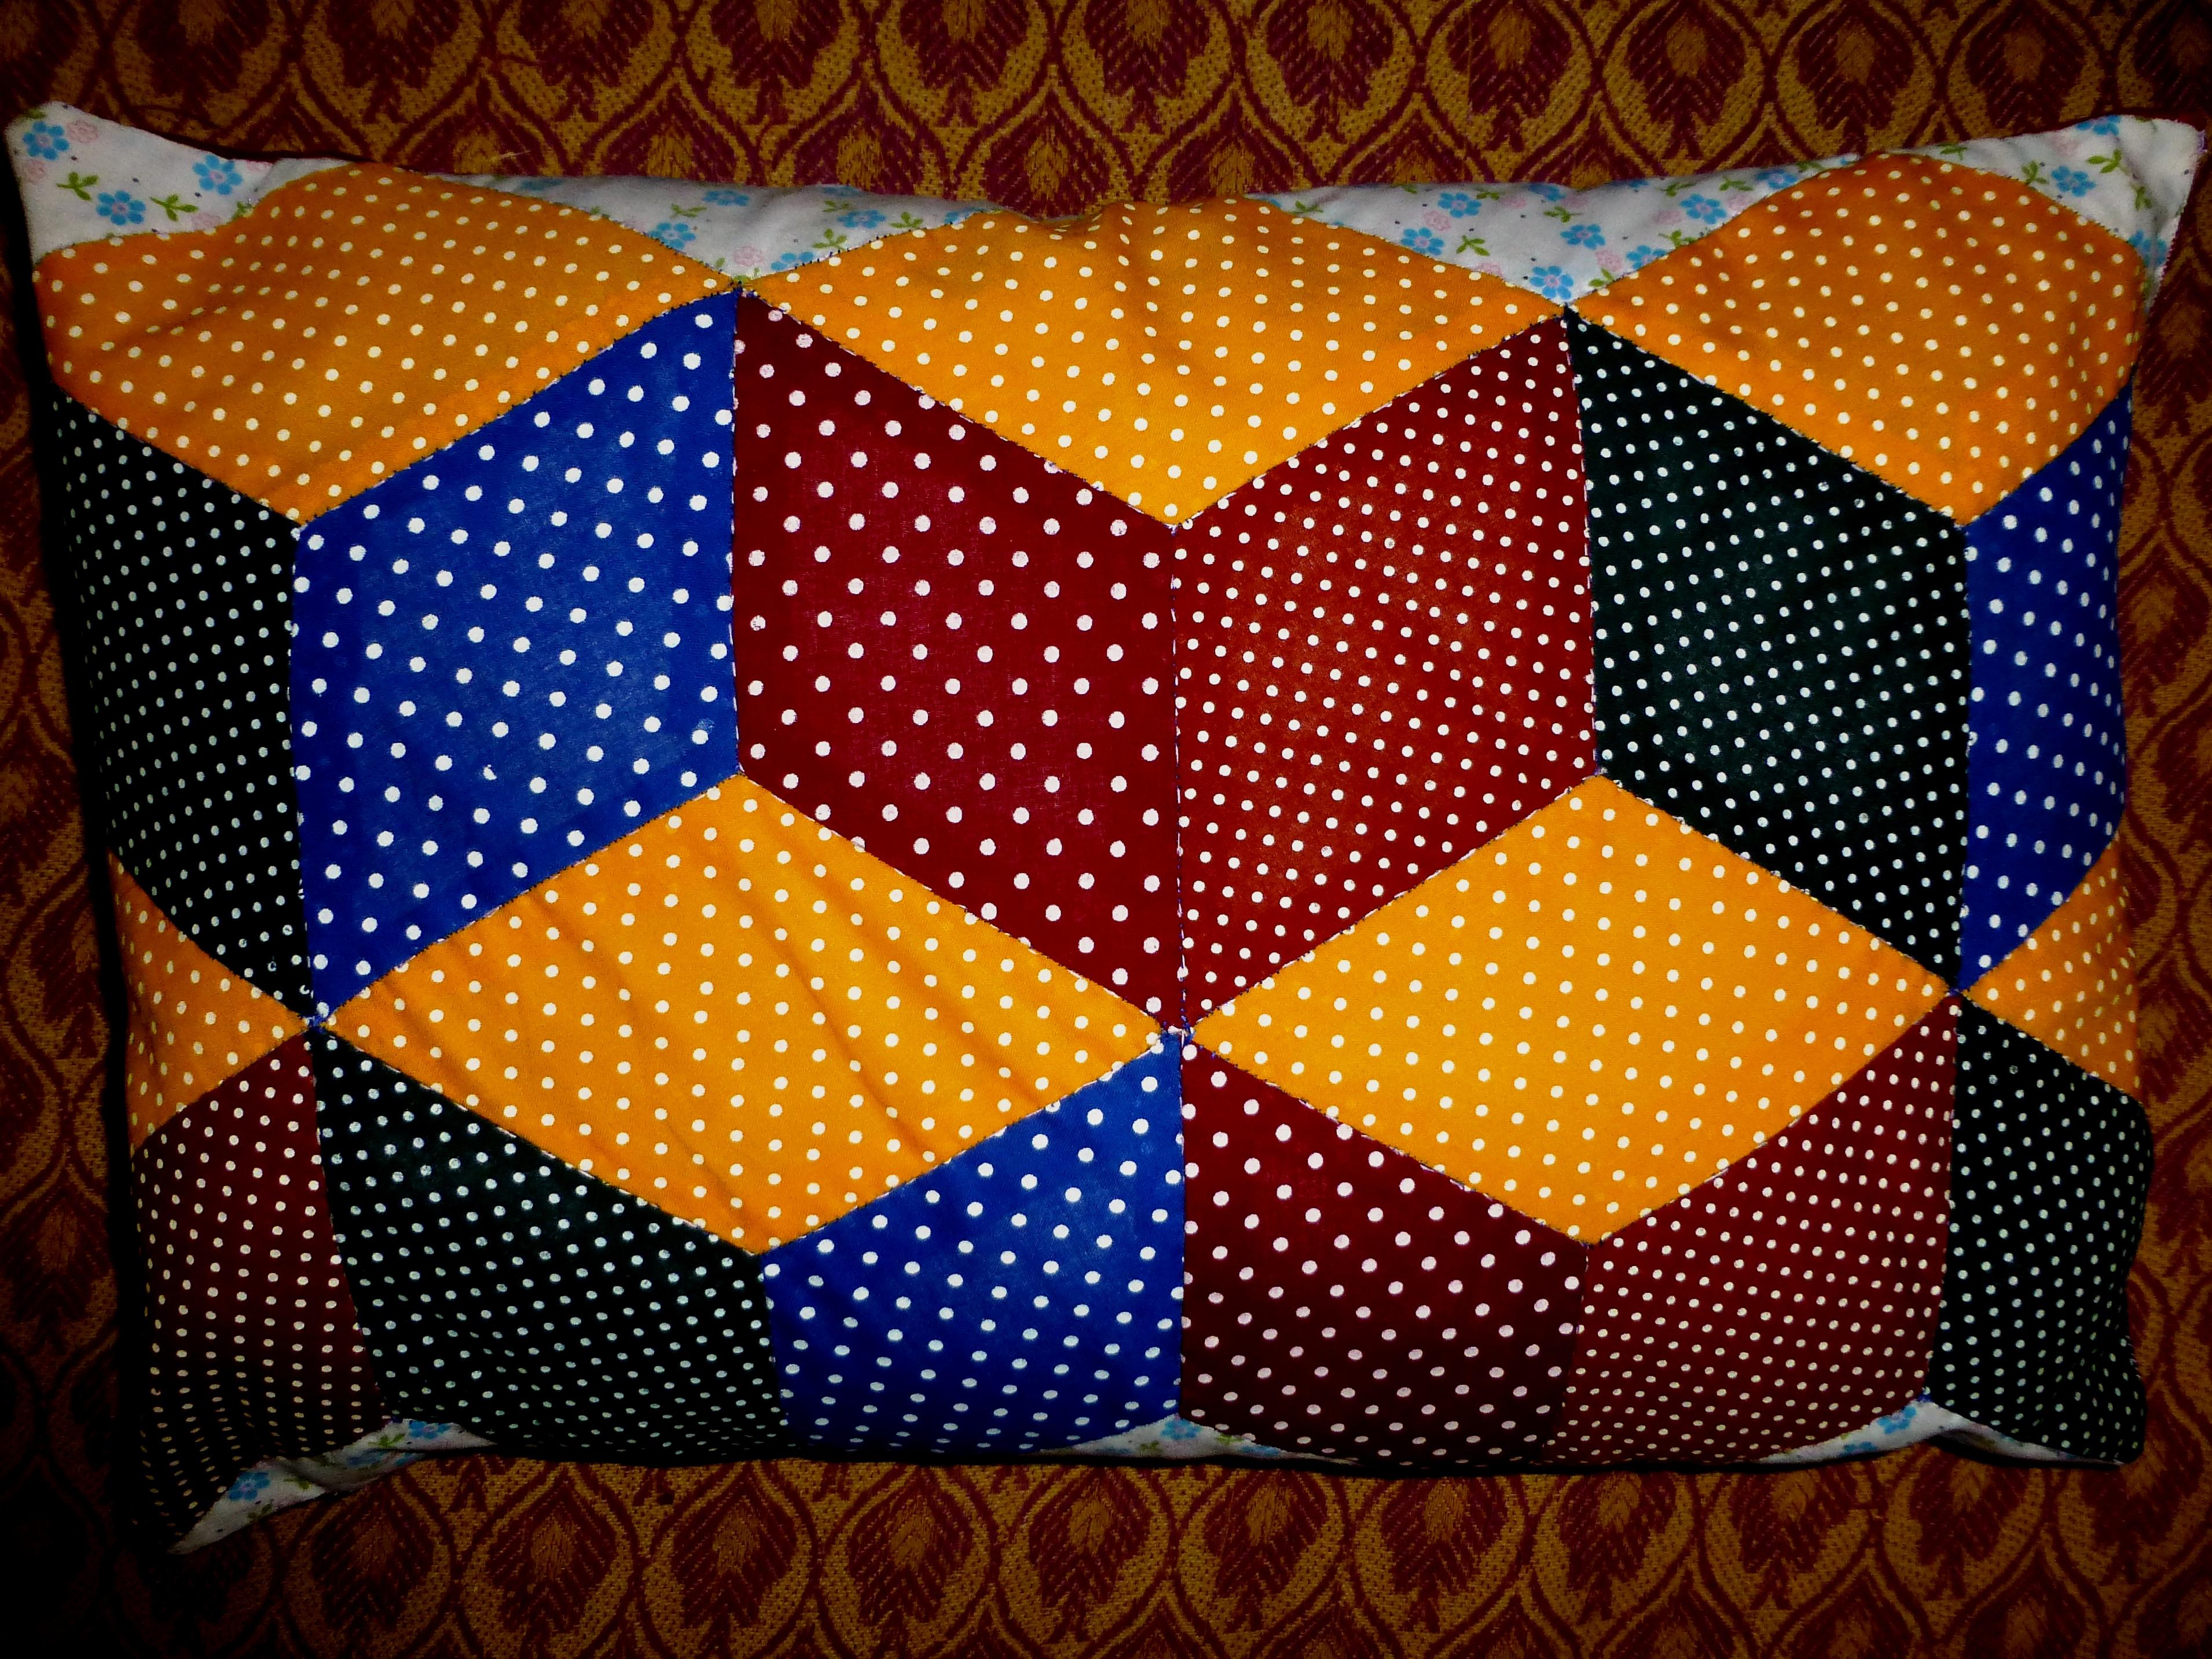 Paper Piecing a 3-D Looking Pillow